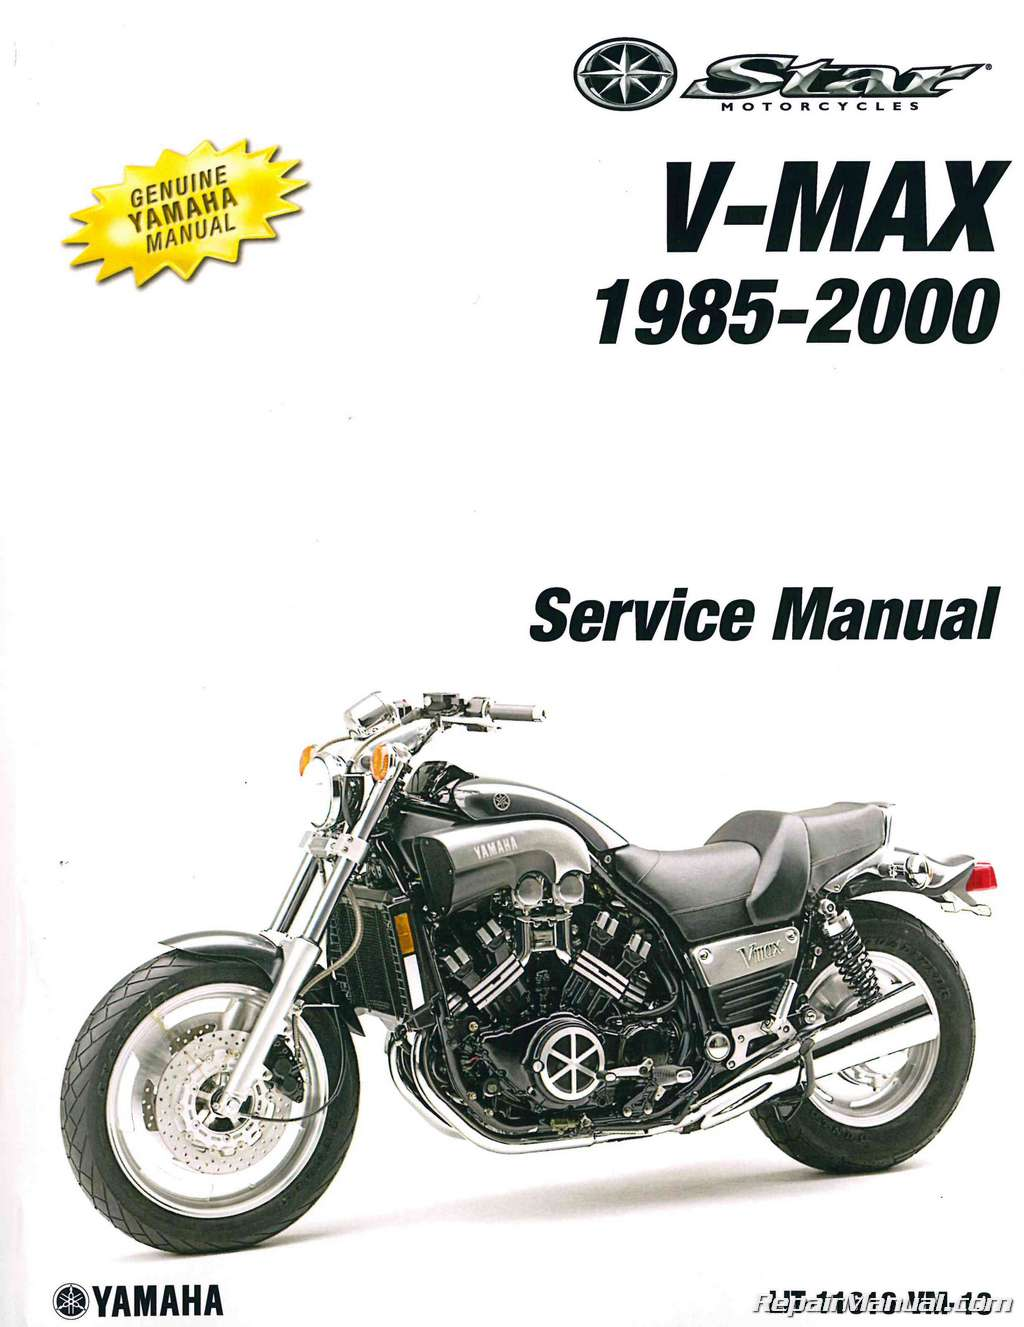 free yamaha motorcycle service manuals online disrespect1st com rh disrespect1st com Honda 9Hp Engine Shop Manual Intek 190 Pressure Washer Manual